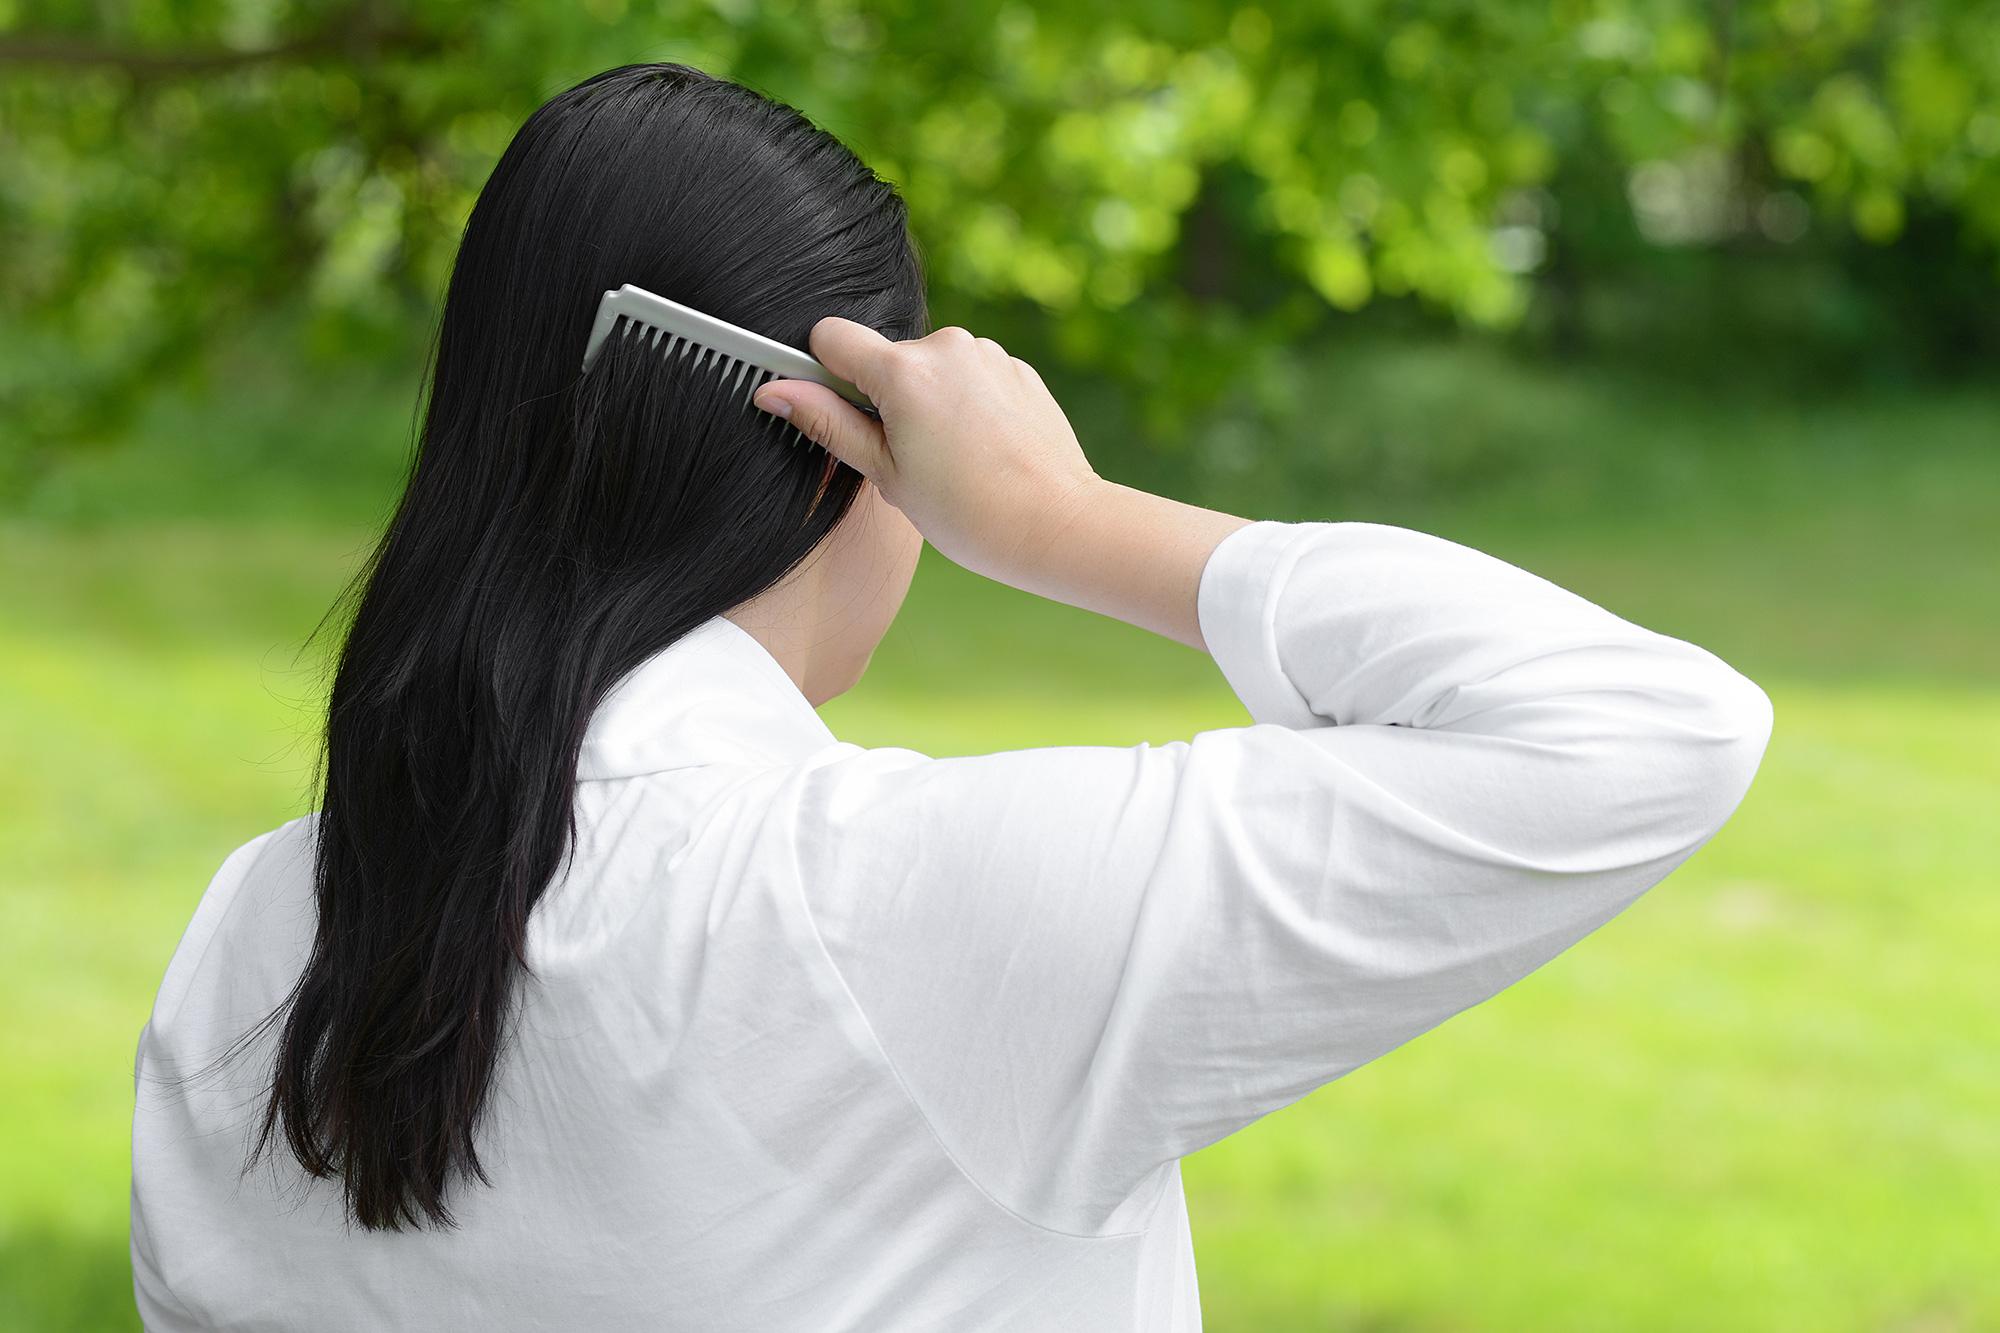 wash-head-kamm-hair-haare-Anna-dabrowski-seife-soap-shampoo-berlin-fotos-fotografie-fotografie-beauty